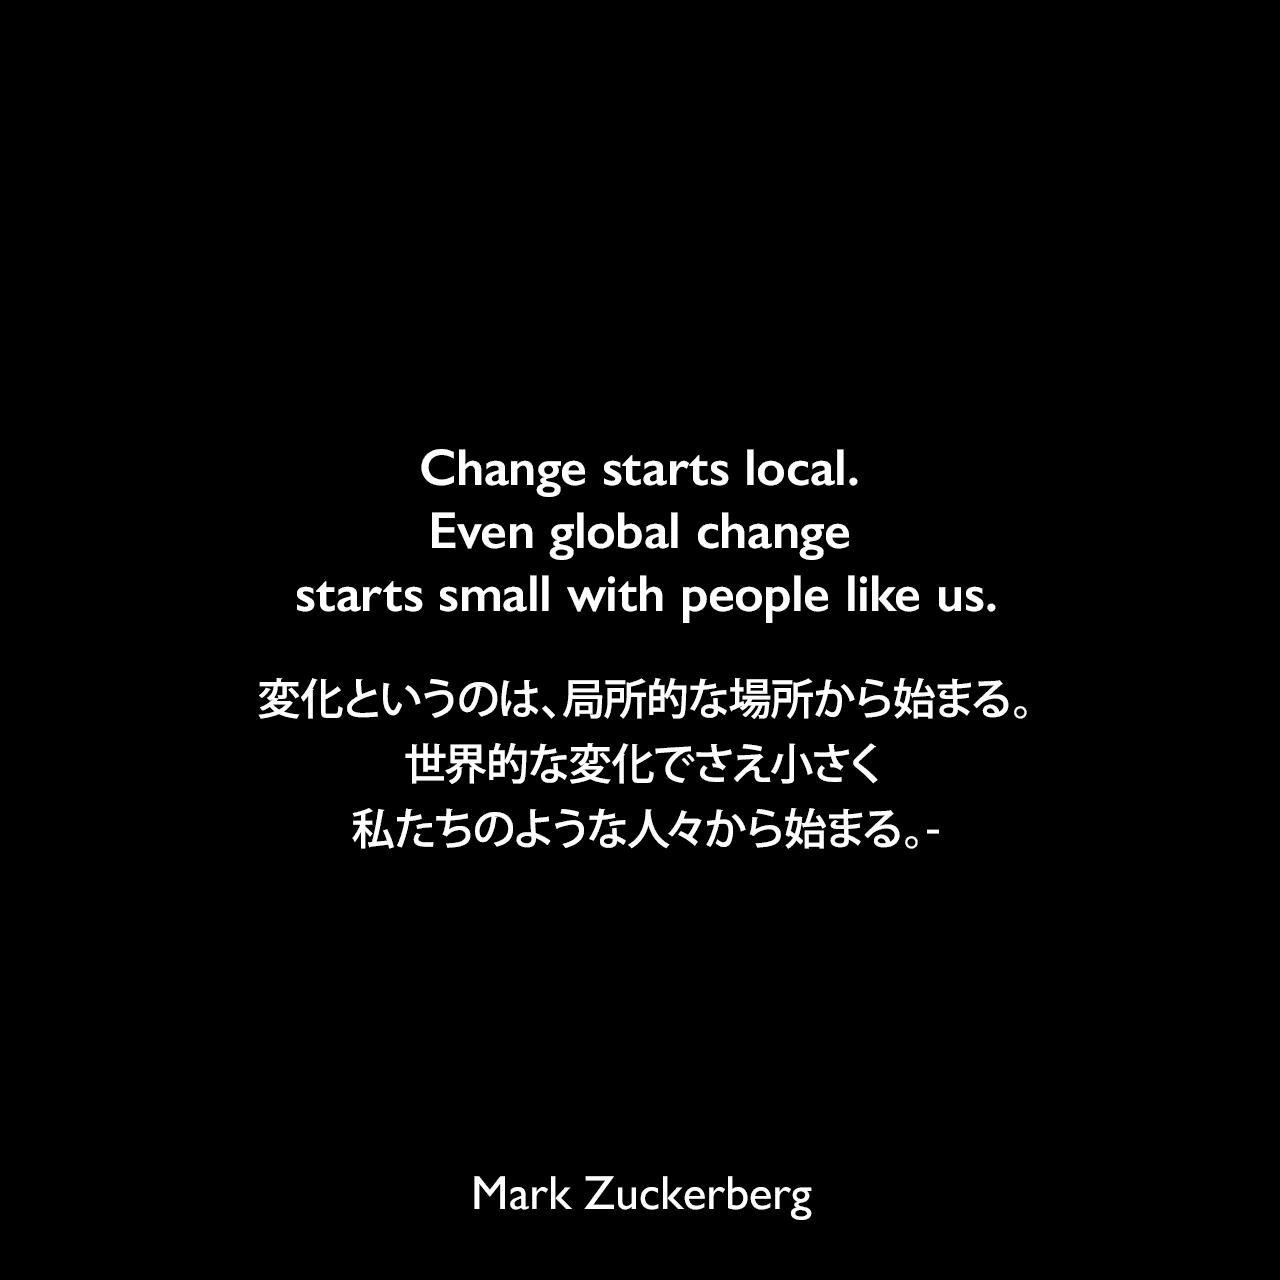 Change starts local. Even global change starts small with people like us.変化というのは、局所的な場所から始まる。世界的な変化でさえ小さく、私たちのような人々から始まる。- 2017年 ハーバード大学の卒業式でスピーチよりMark Zuckerberg